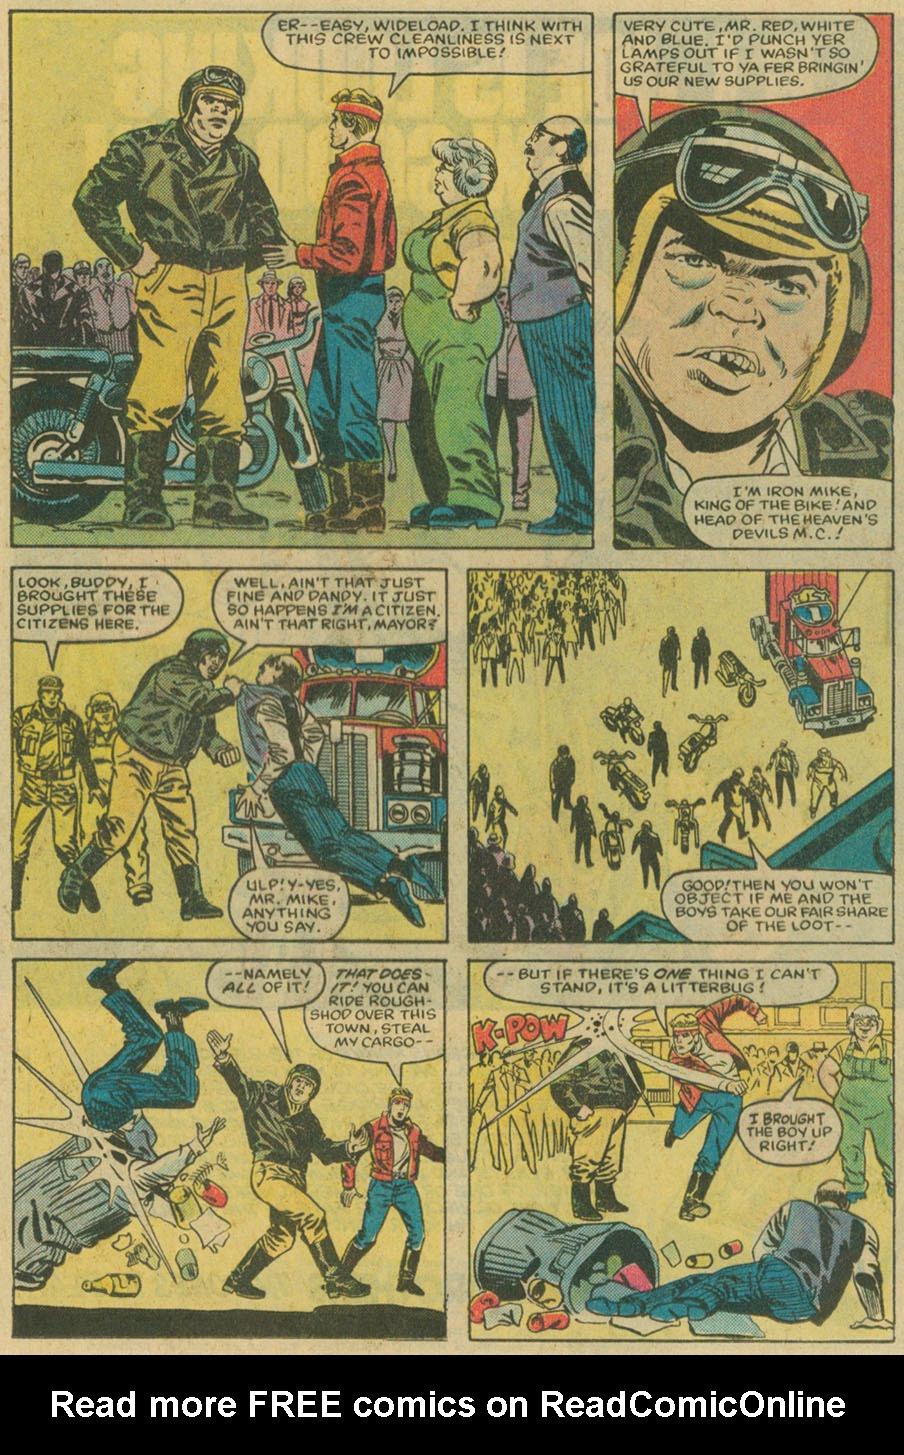 Read online U.S. 1 comic -  Issue #6 - 15